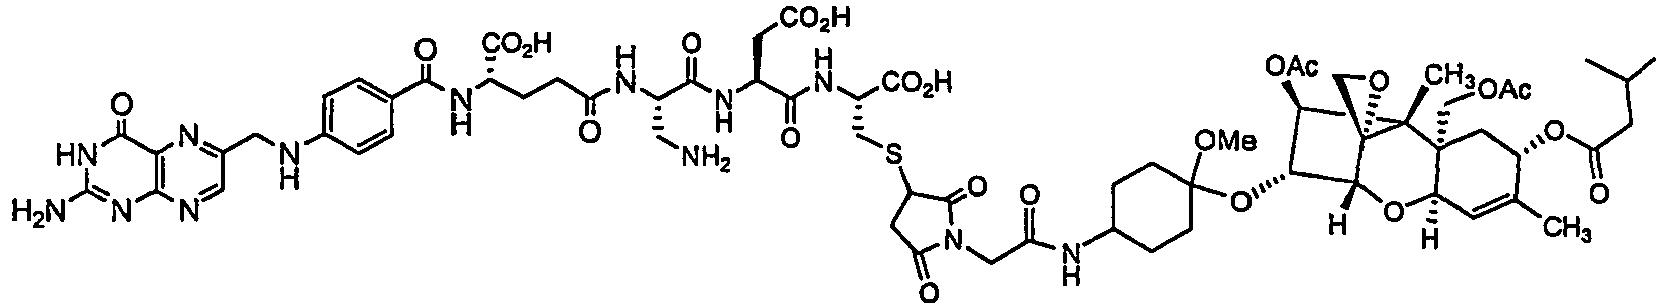 Figure imgb0060